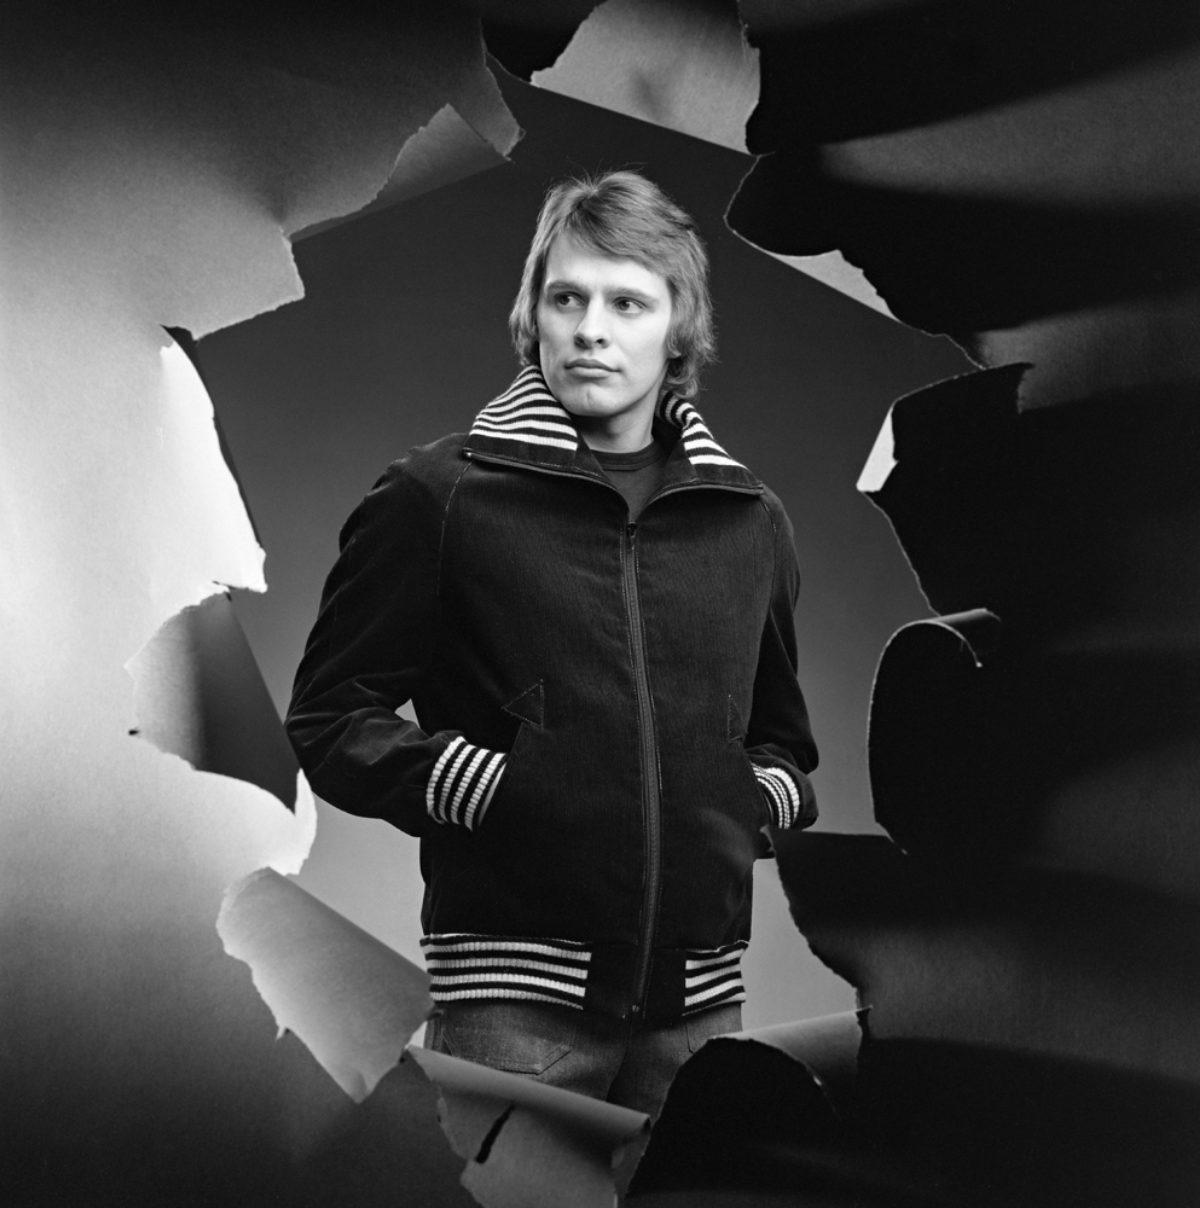 Manchesterkavaj. Som fotomodell boxaren Arto Nilsson, 1973. Foto: Kari Pulkkinen / Journalistiska bildarkivet JOKA / Museiverket